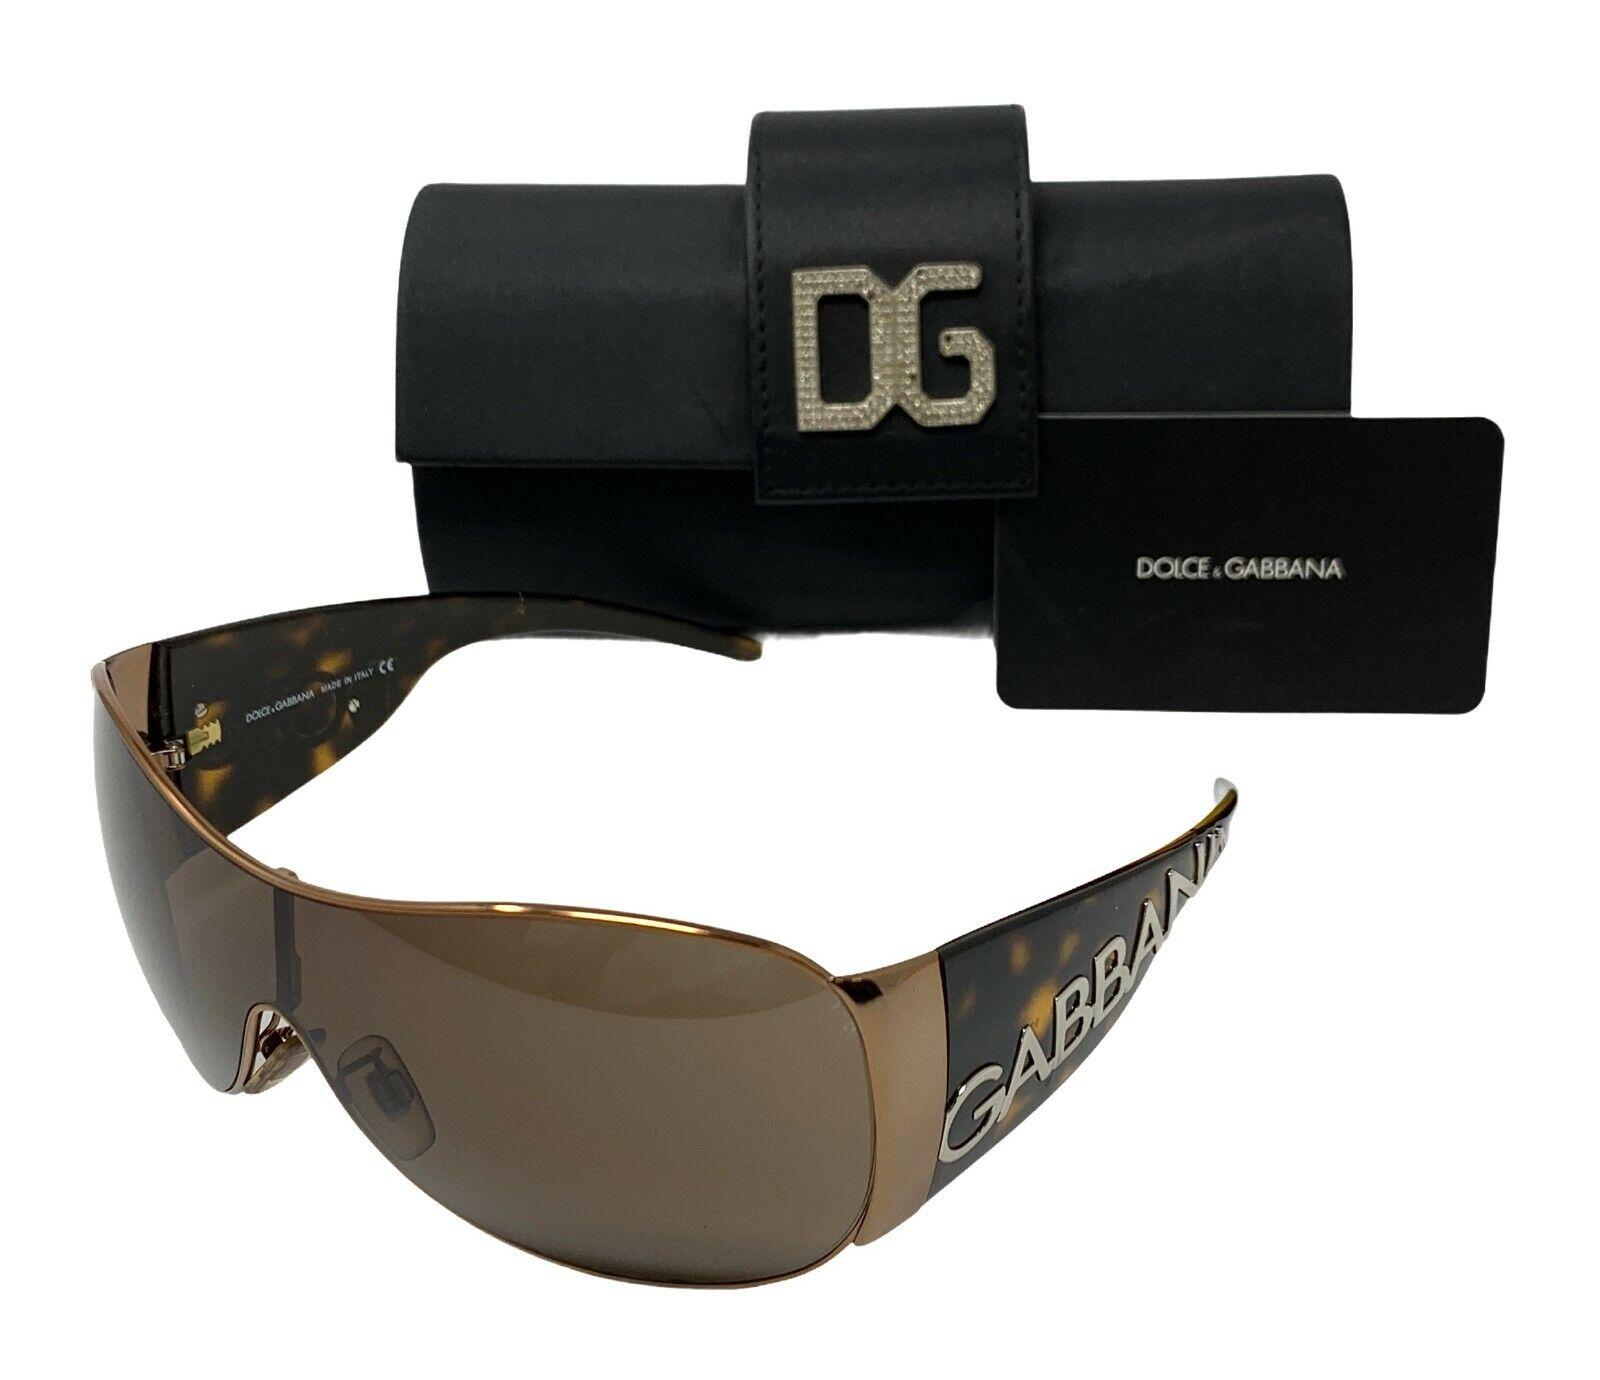 DOLCE&GABBANA Logo Sunglasses Shades Accessories Brown Silver RankAB